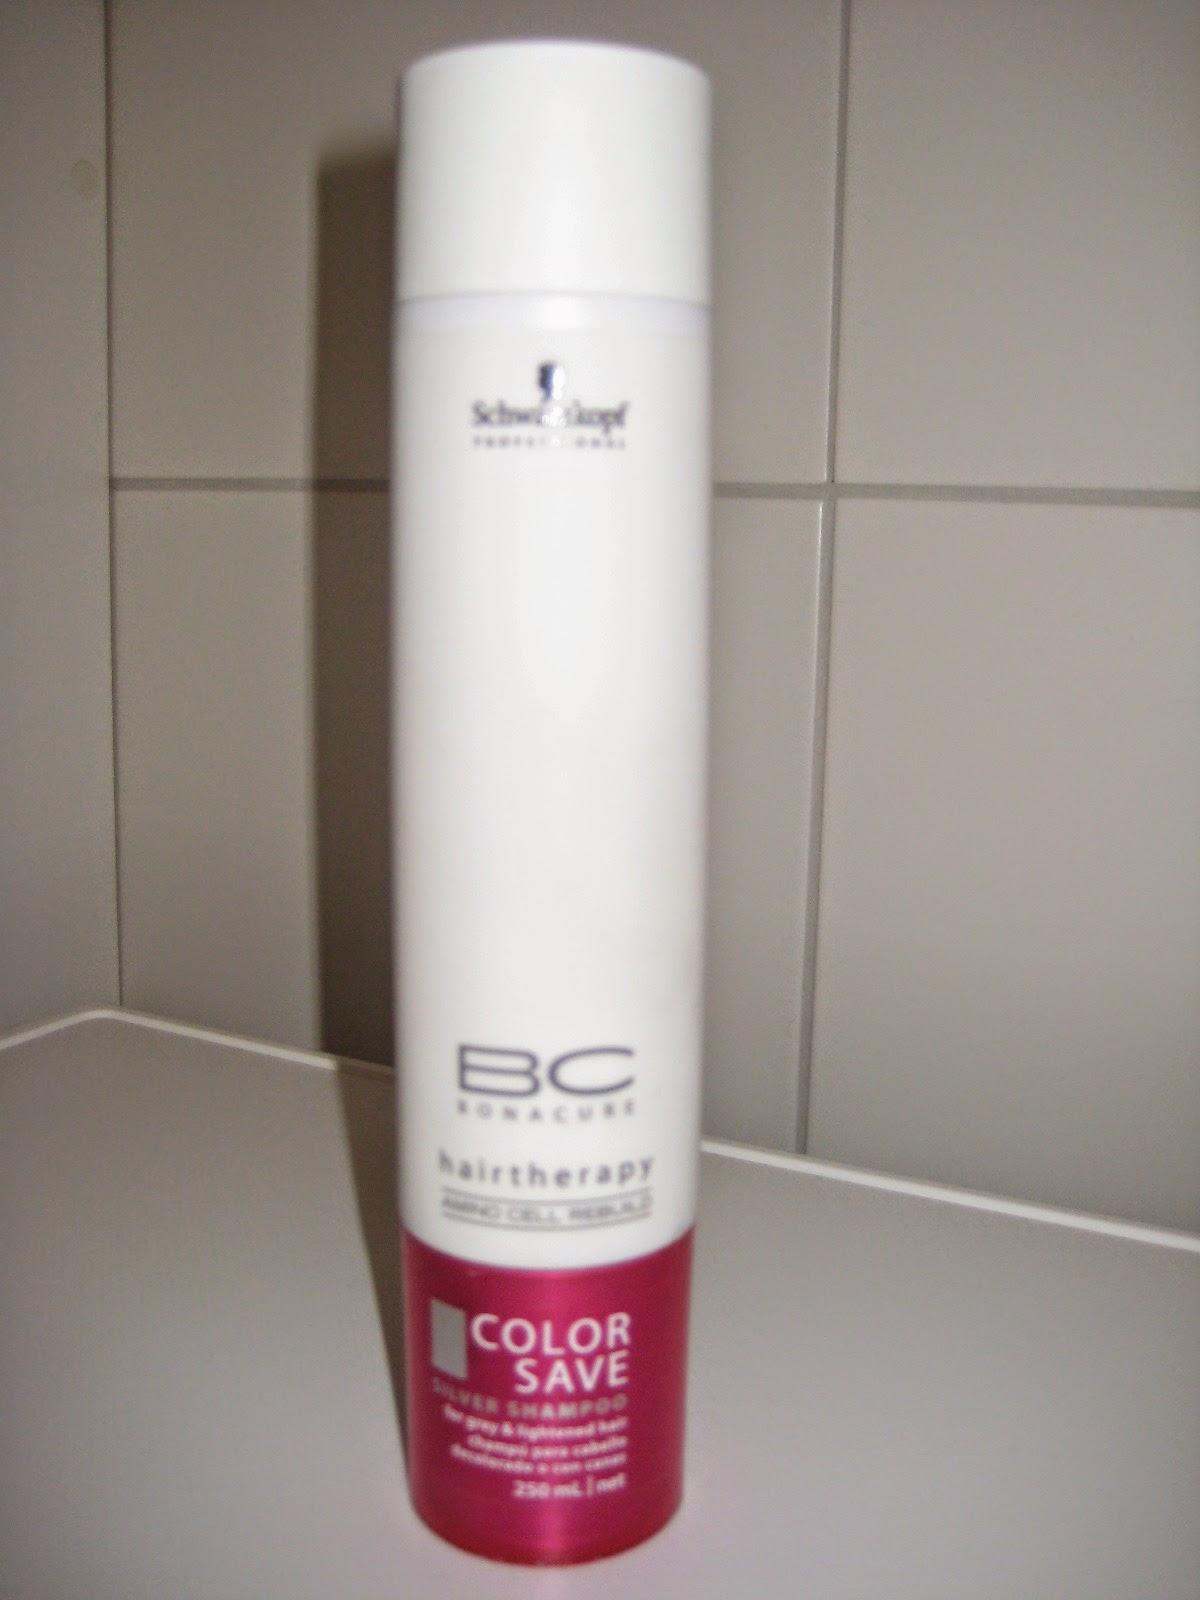 bc, vaaleatukka, blonde, blondehairproducts, colorsave, blondecolorsave, silvershampoo, hopeashampoo, bcsilvershampoo